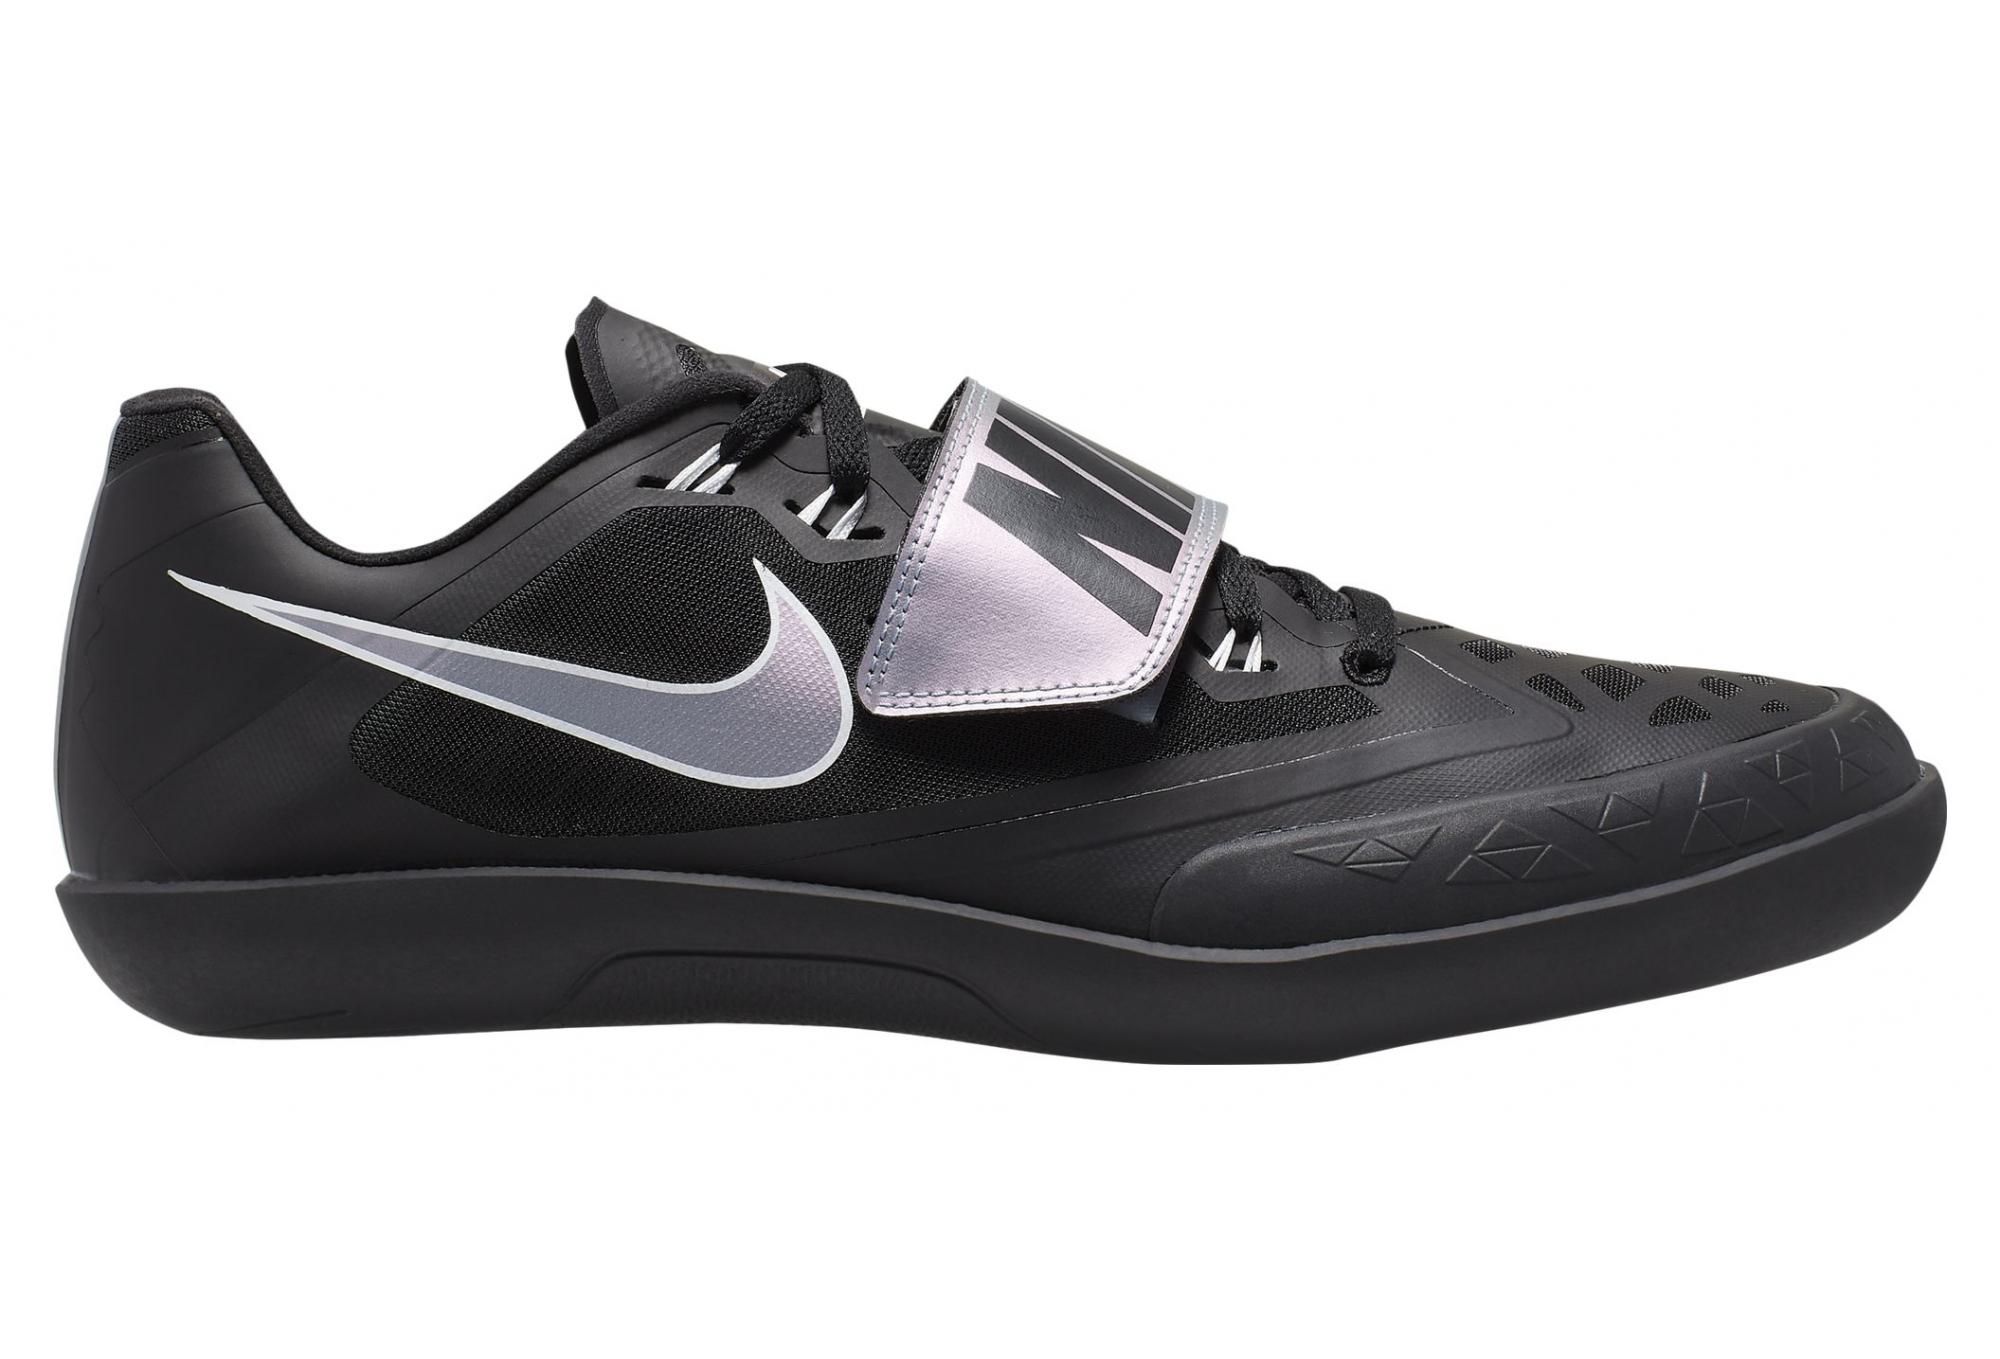 Nike Zoom SD 4 Black Blue Unisex